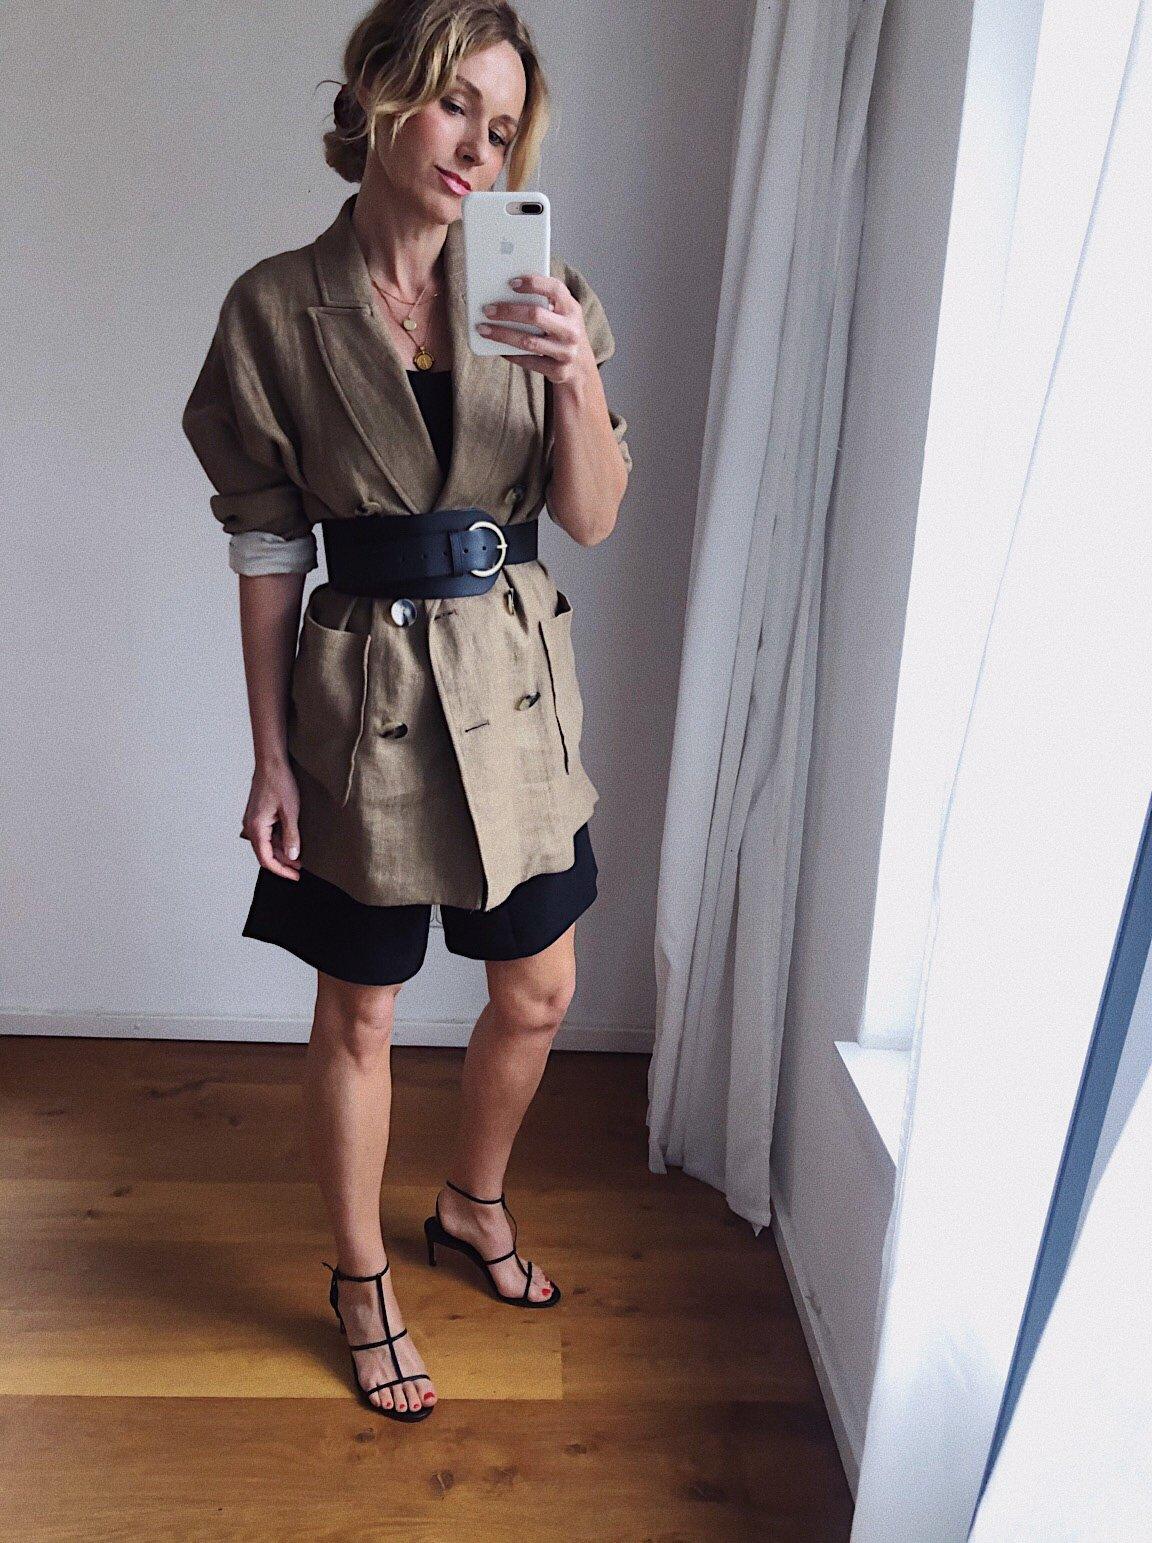 Bermuda-Shorts-Outfit-Büro-Nowshine-Blog-ü-40